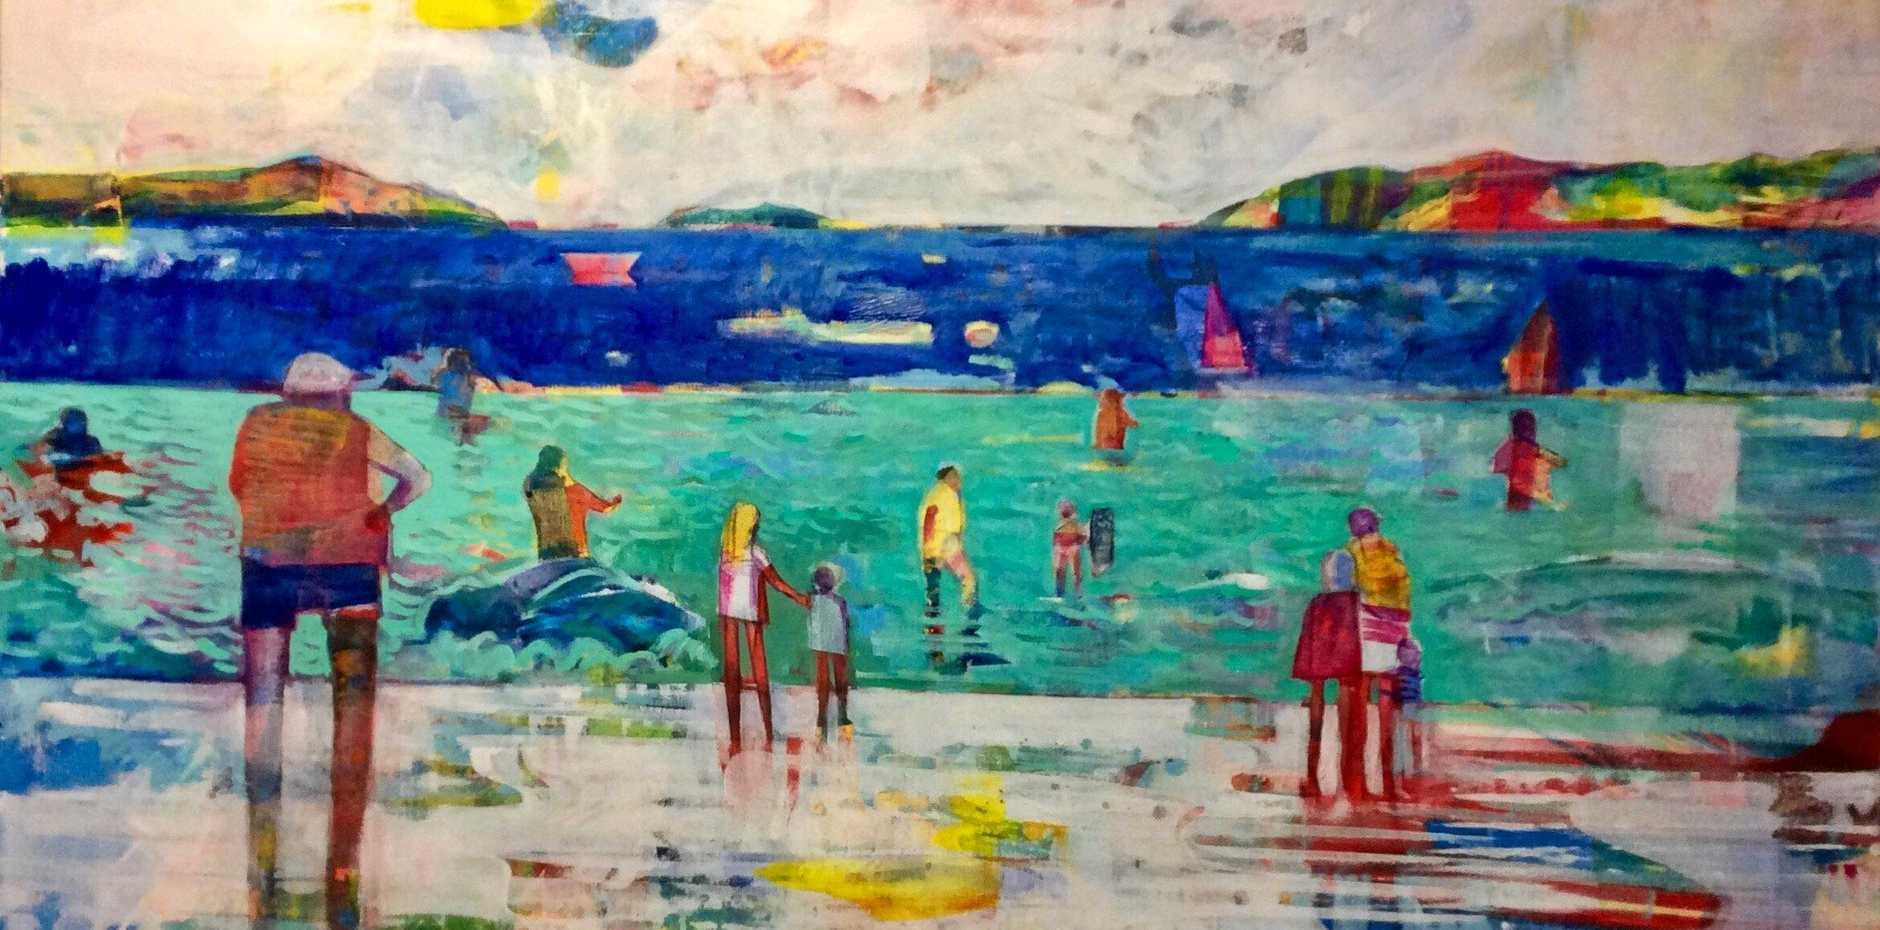 COLOUFUL: Beach People 4 by Nick Olsen.